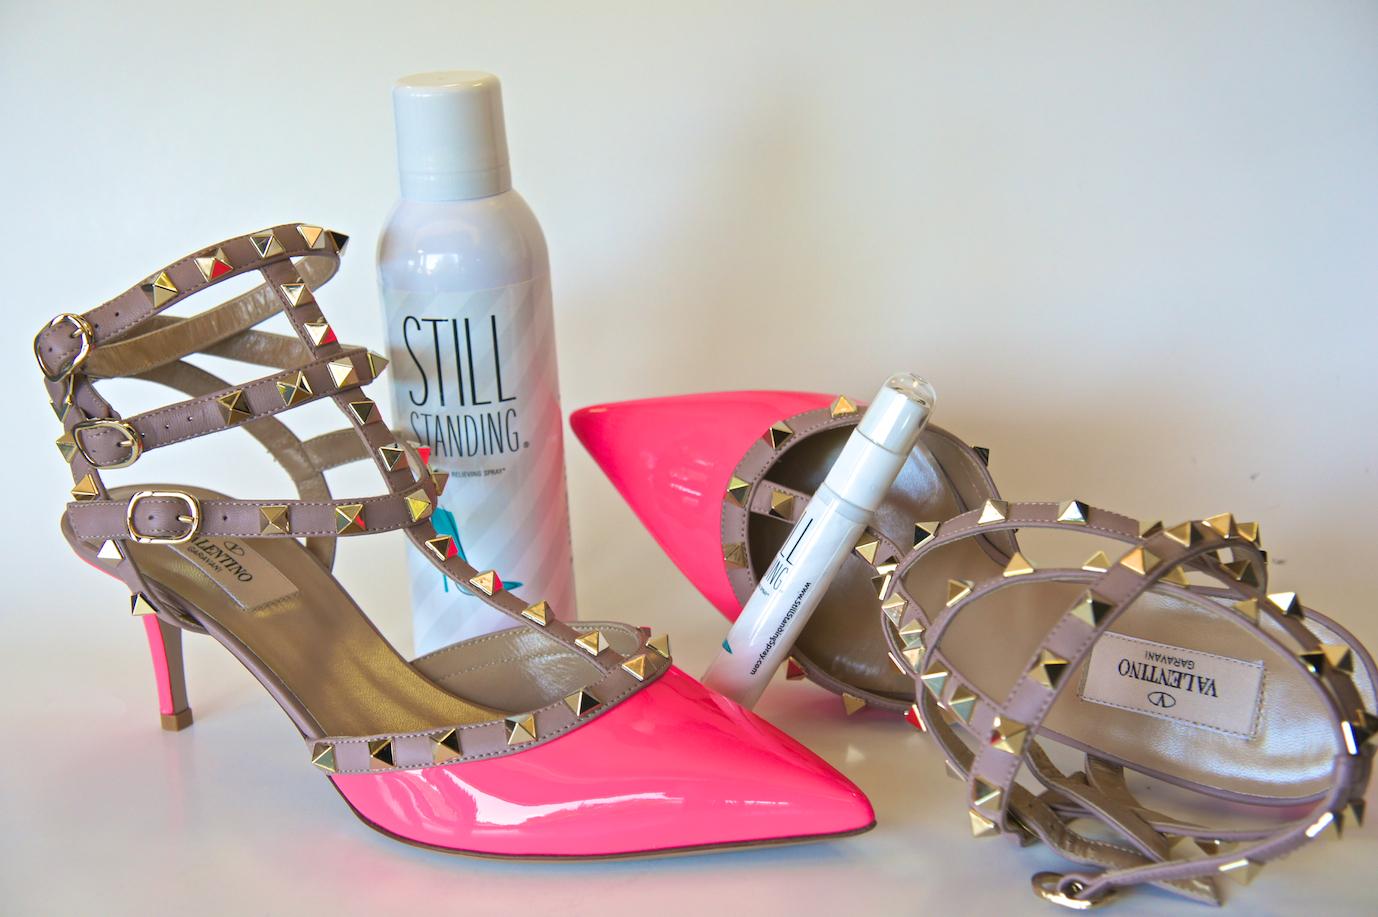 Still-Standing-valentino-Rockstud-heels-pain-relief